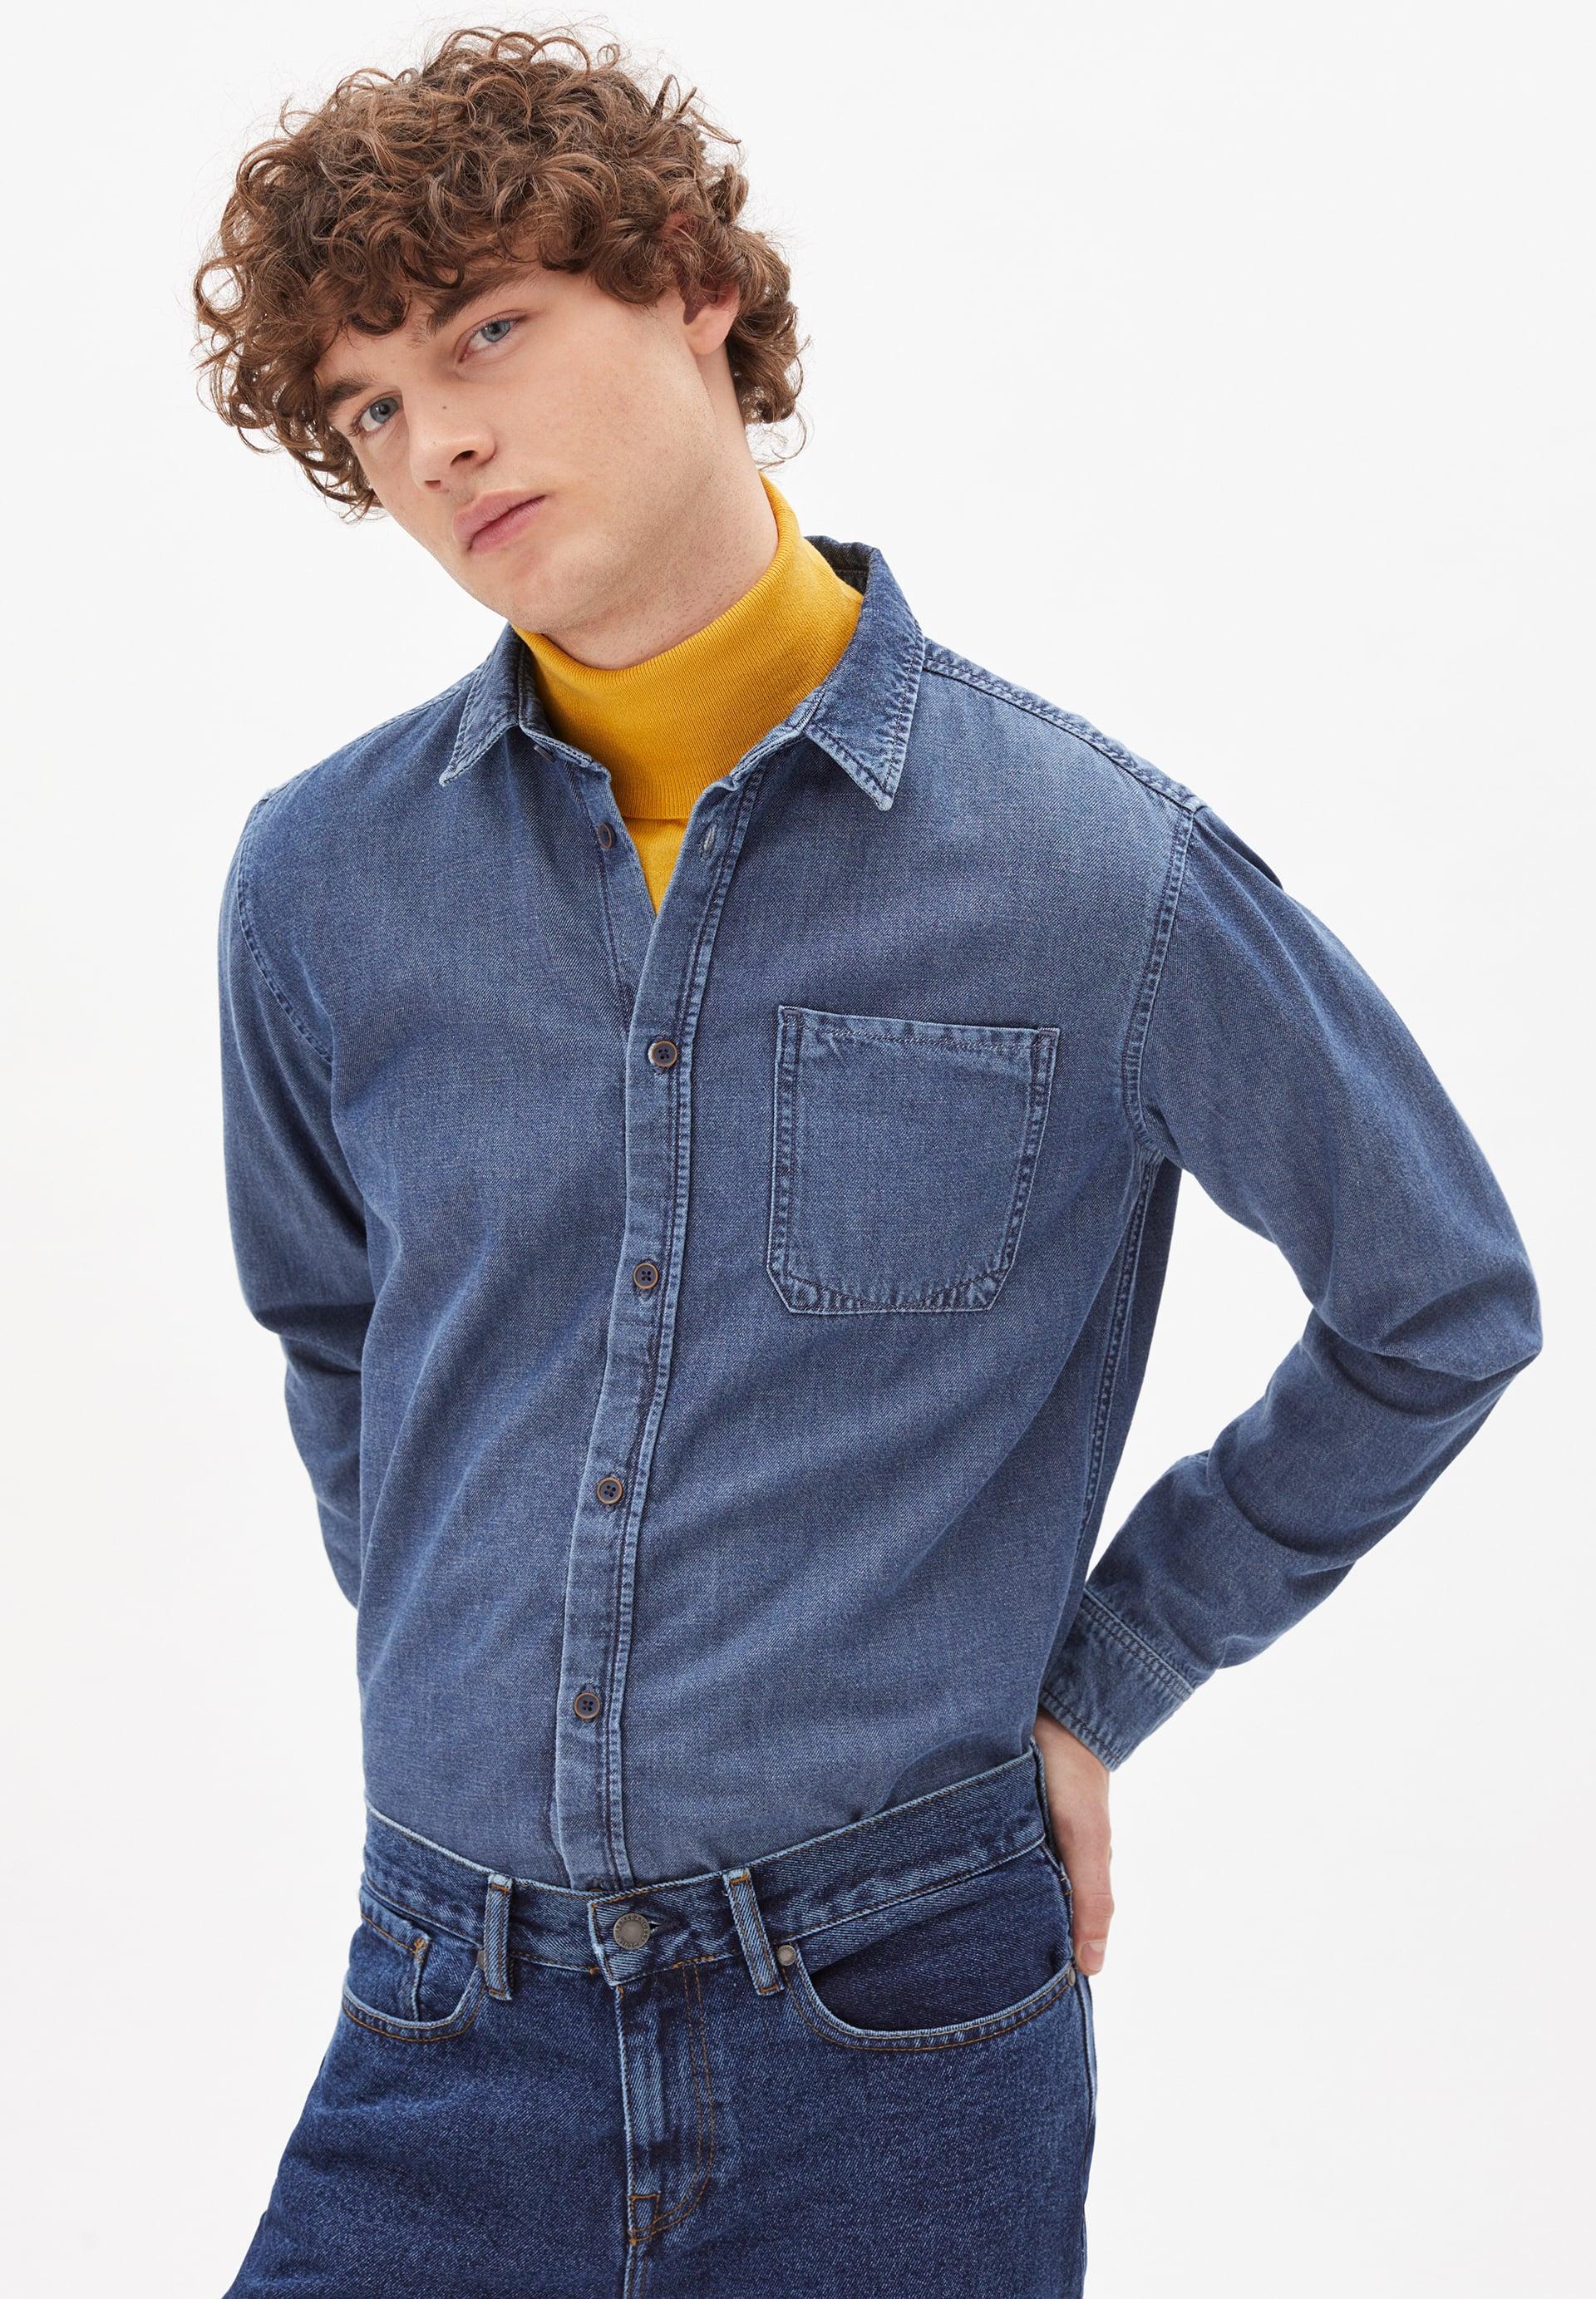 TIAANS Shirt made of Organic Cotton